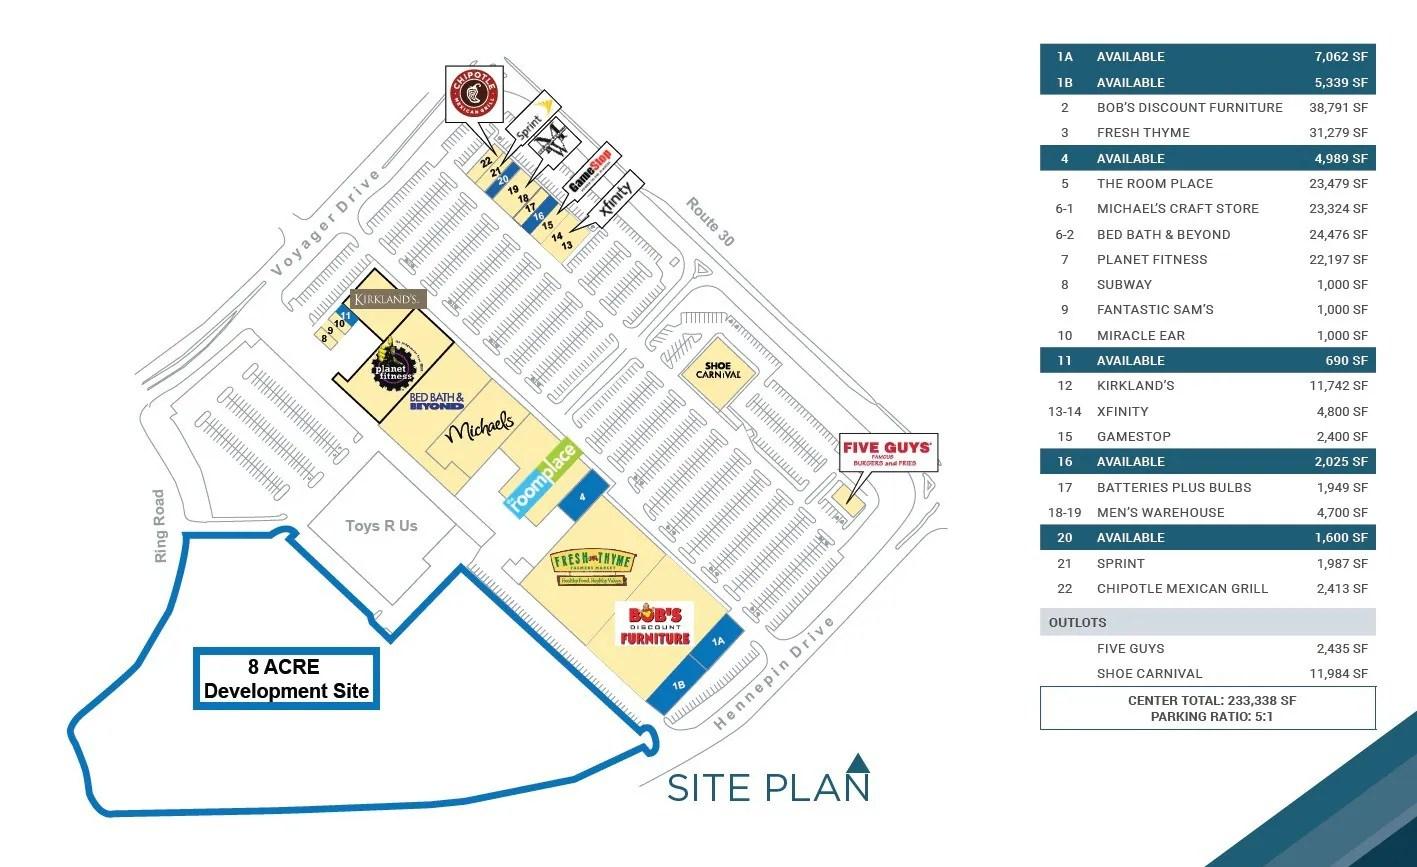 2700 2868 Plainfield Rd Joliet Il 60435 Retail Space For Lease